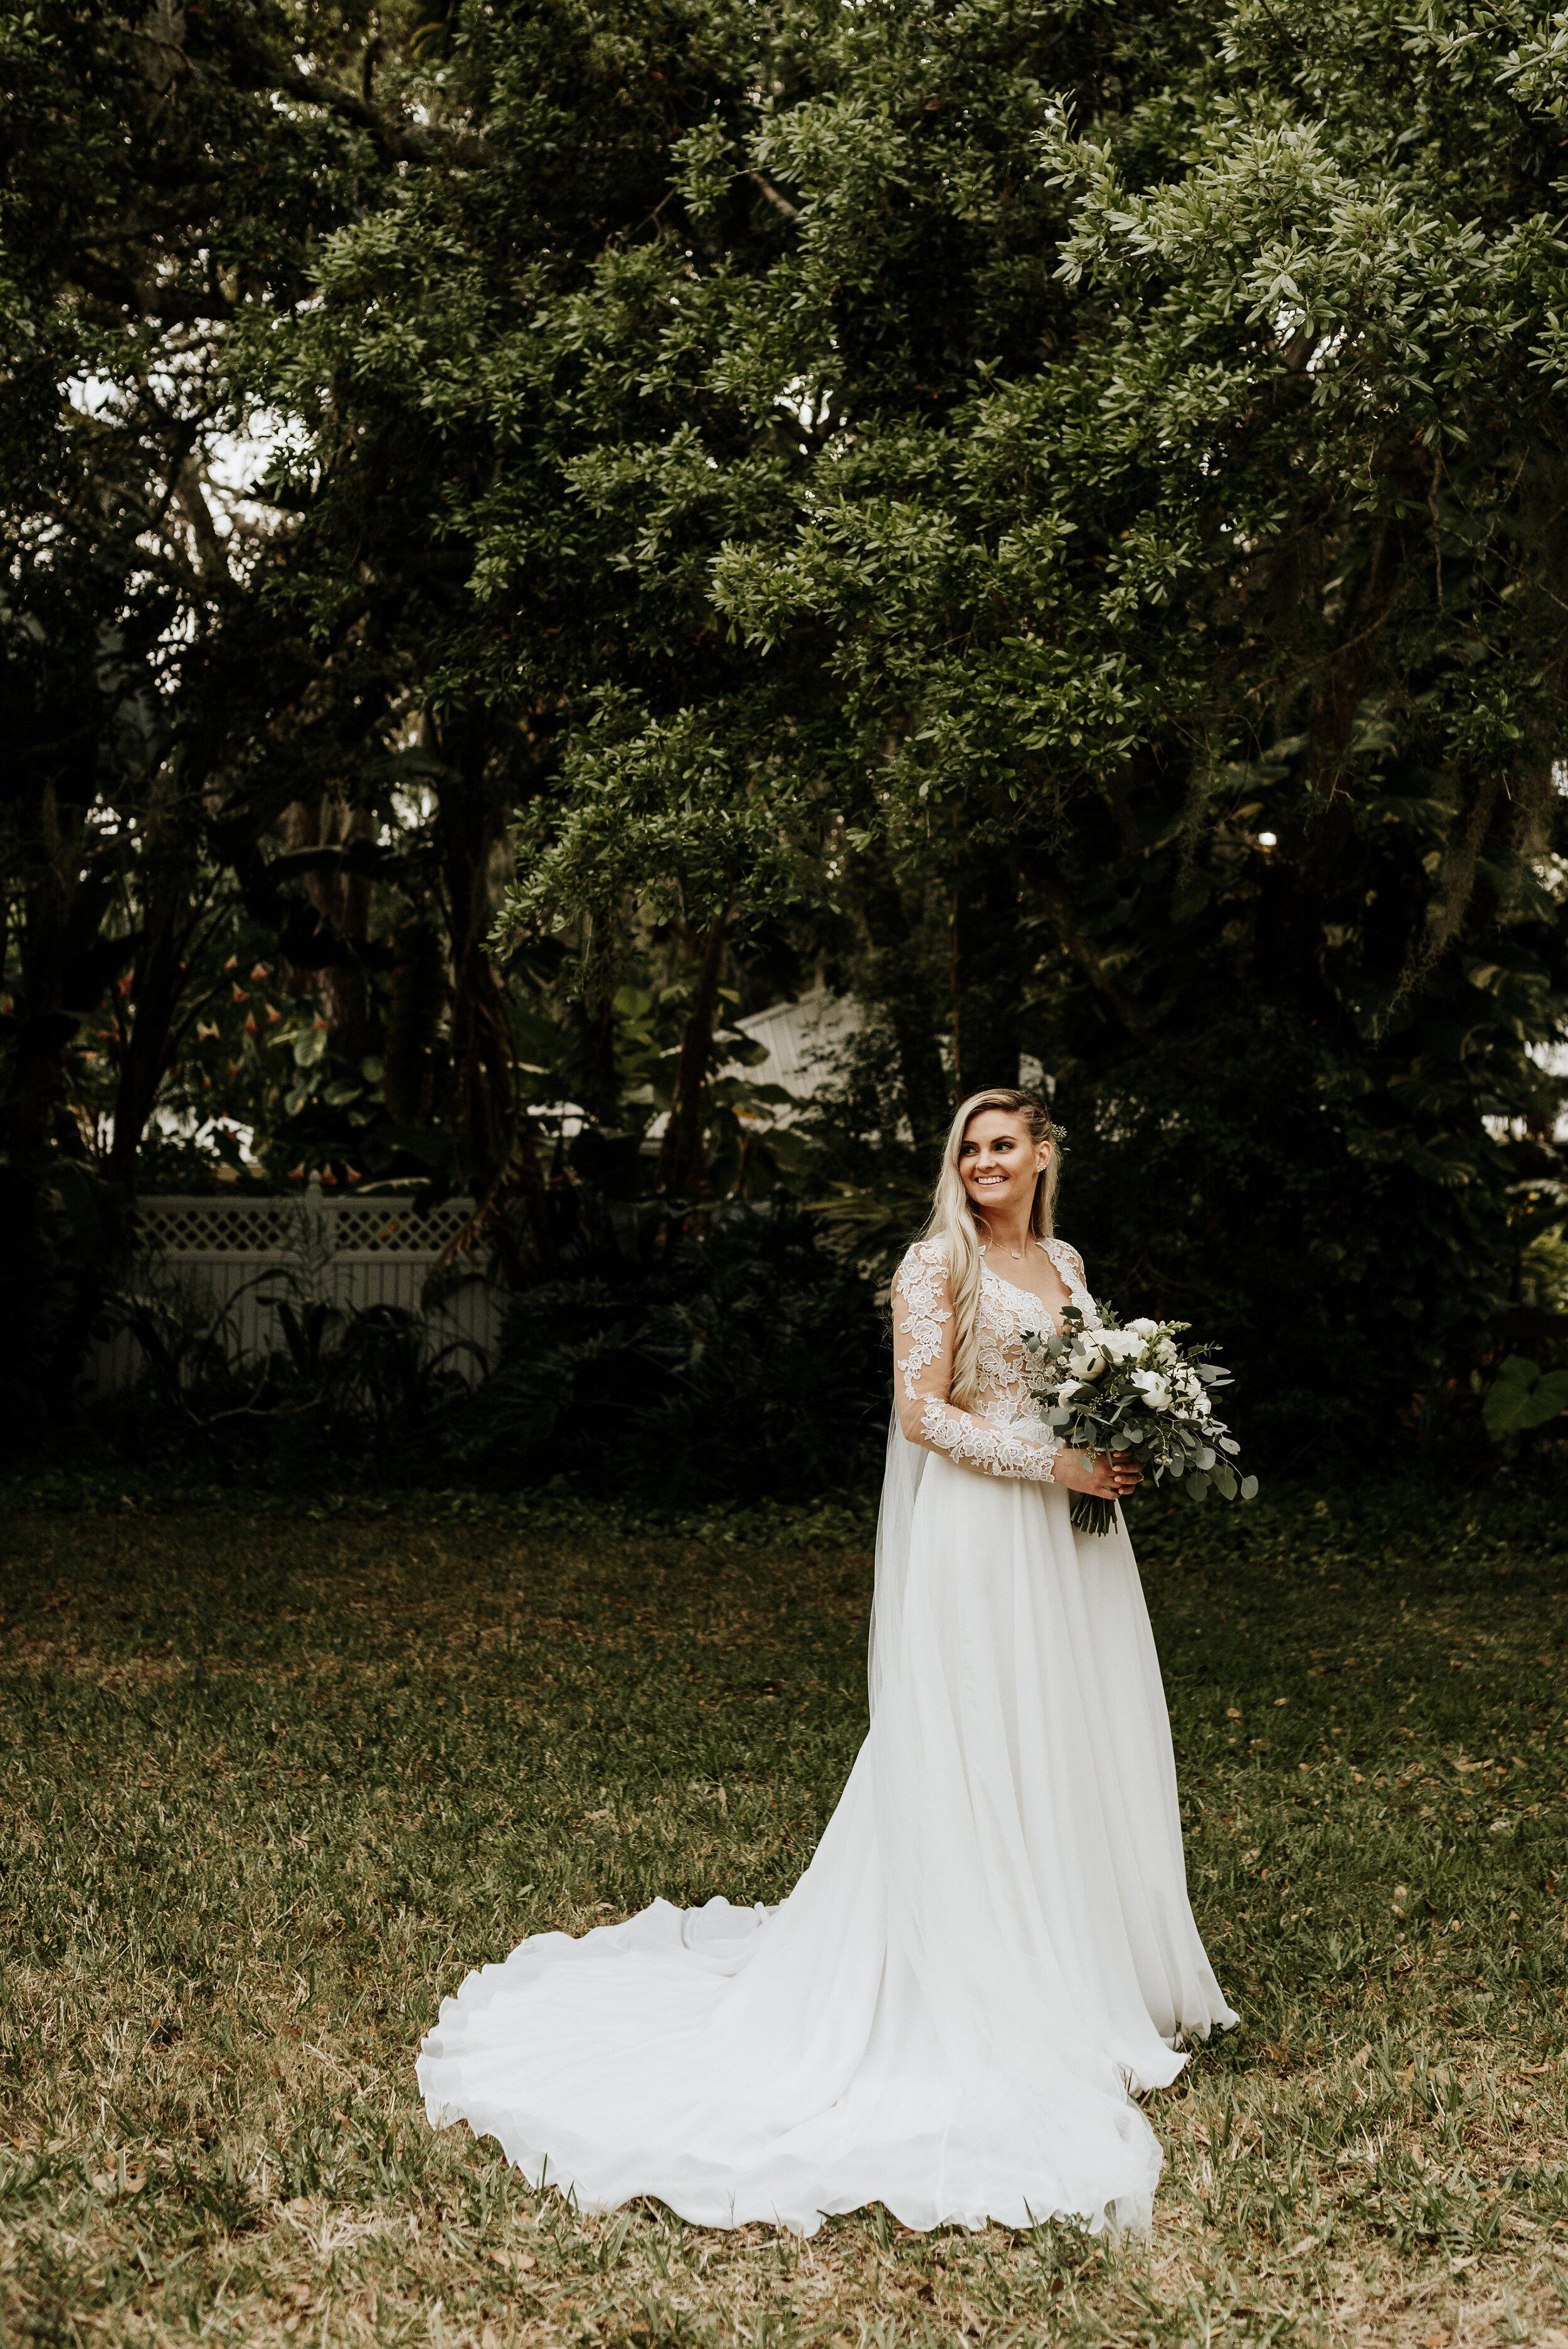 Mikenzi_Brad_Wedding_The_Delamater_House_New_Smyrna_Beach_Florida_Photography_by_V_0702.jpg